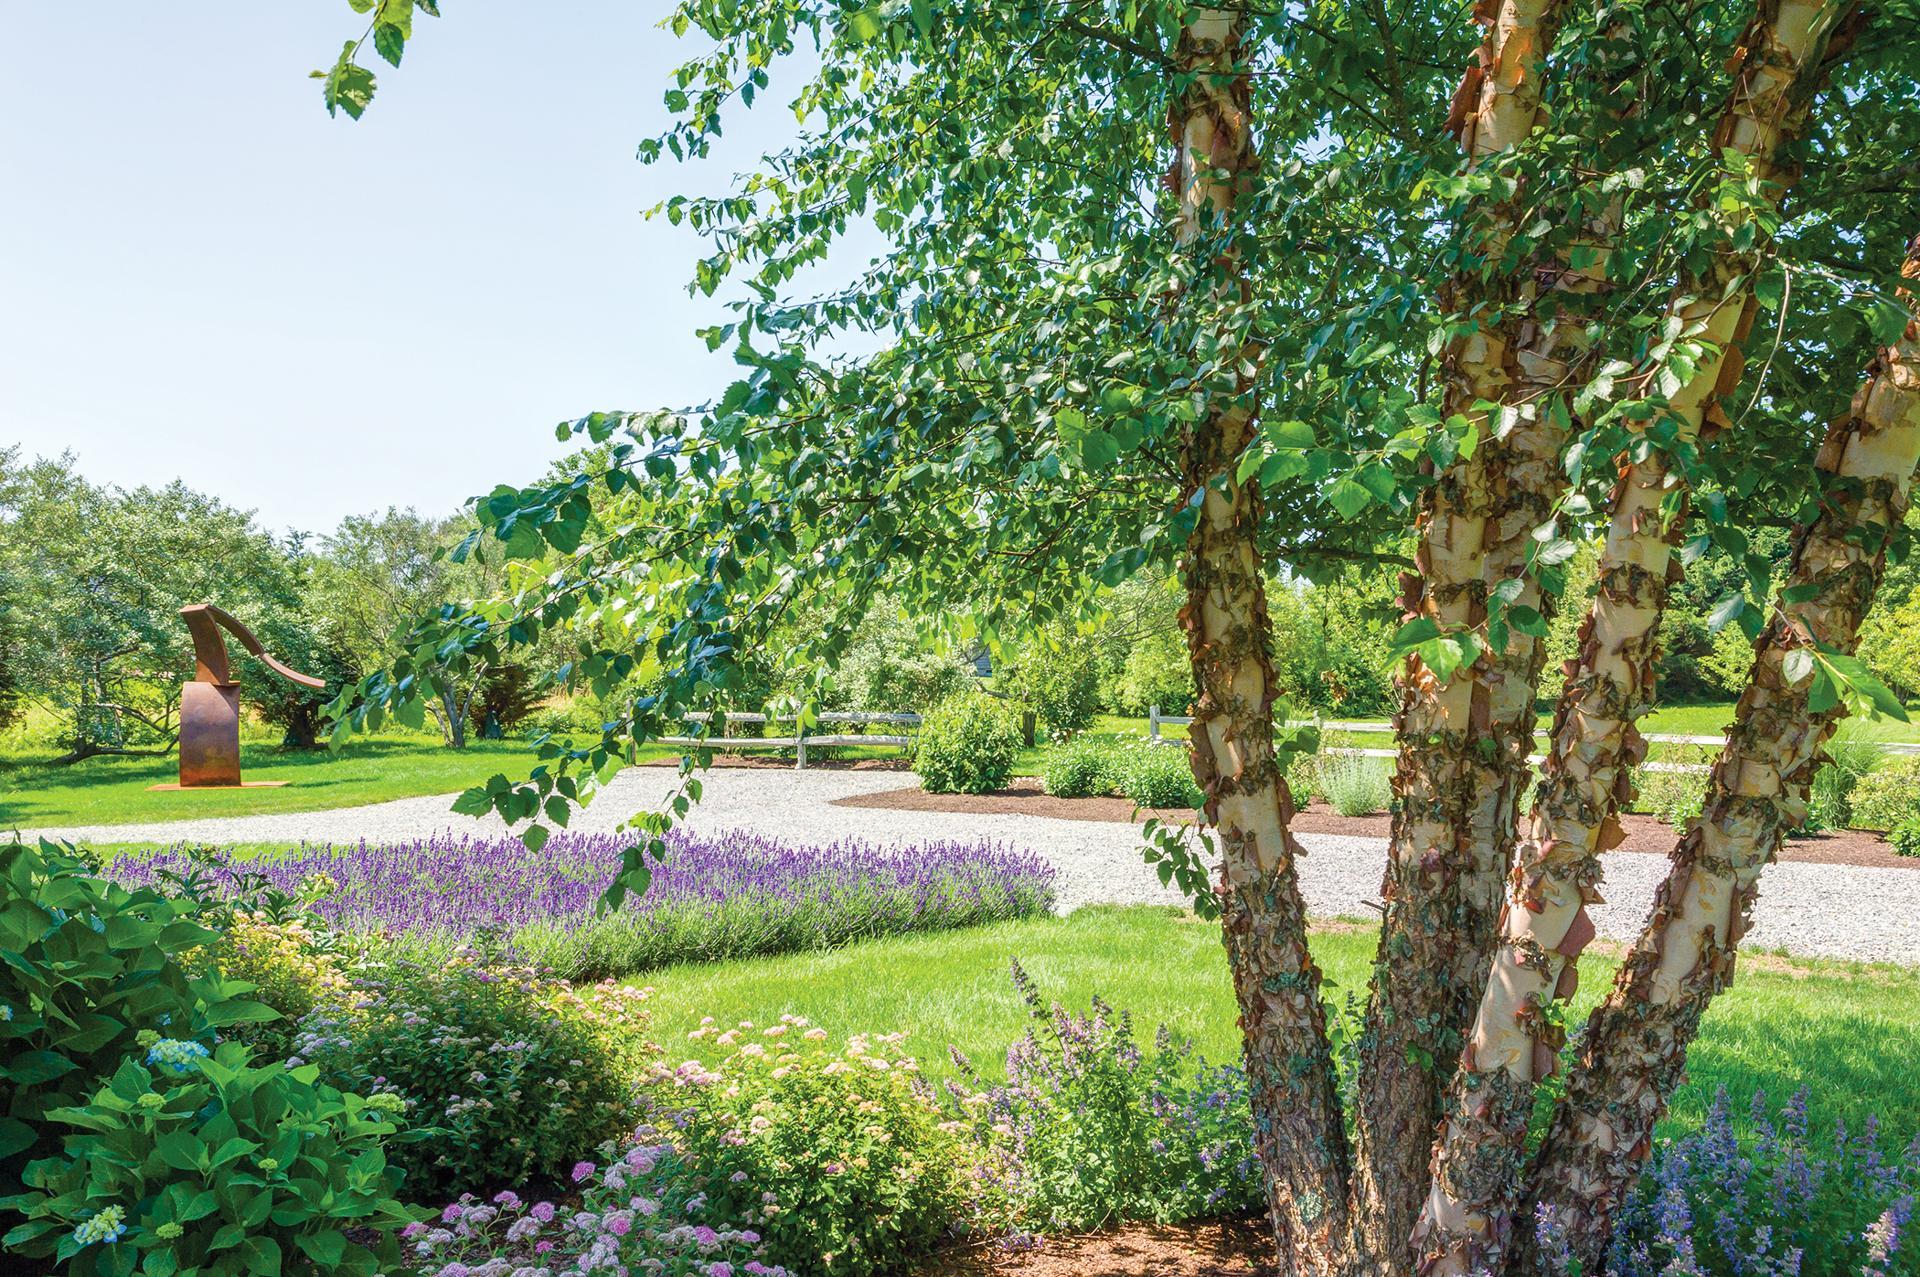 Meadowlark Botanical Gardens Wedding Cost How Much Does A Meadowlark Botanical Gardens Wedding